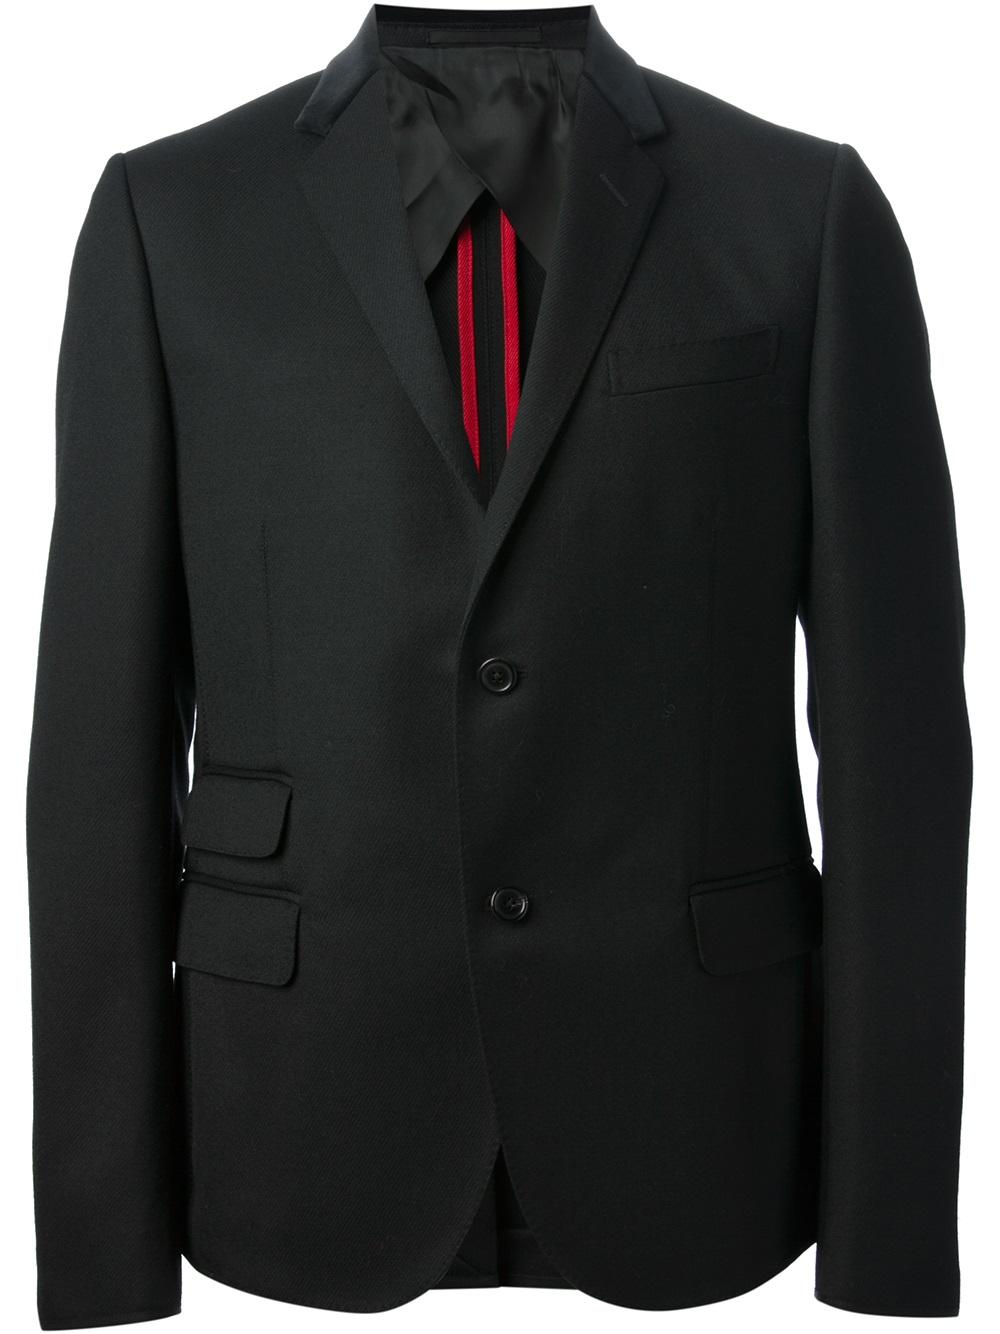 Gucci-black-two-button-blazer